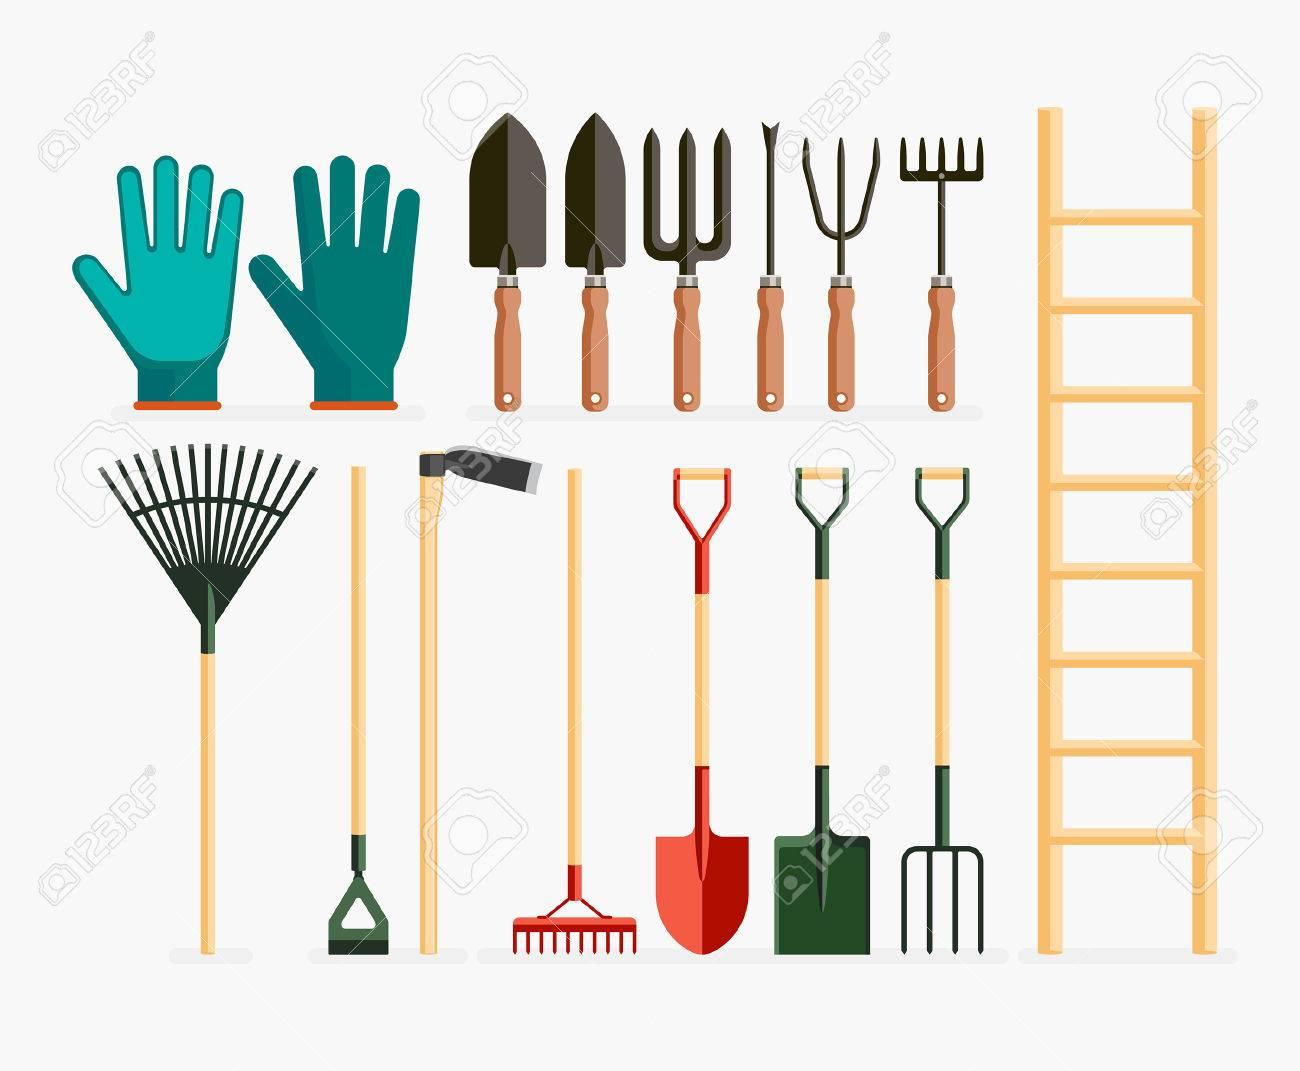 Beau Set Of Garden Tools And Gardening Items. Vector Illustration Flat Design.  Stock Vector